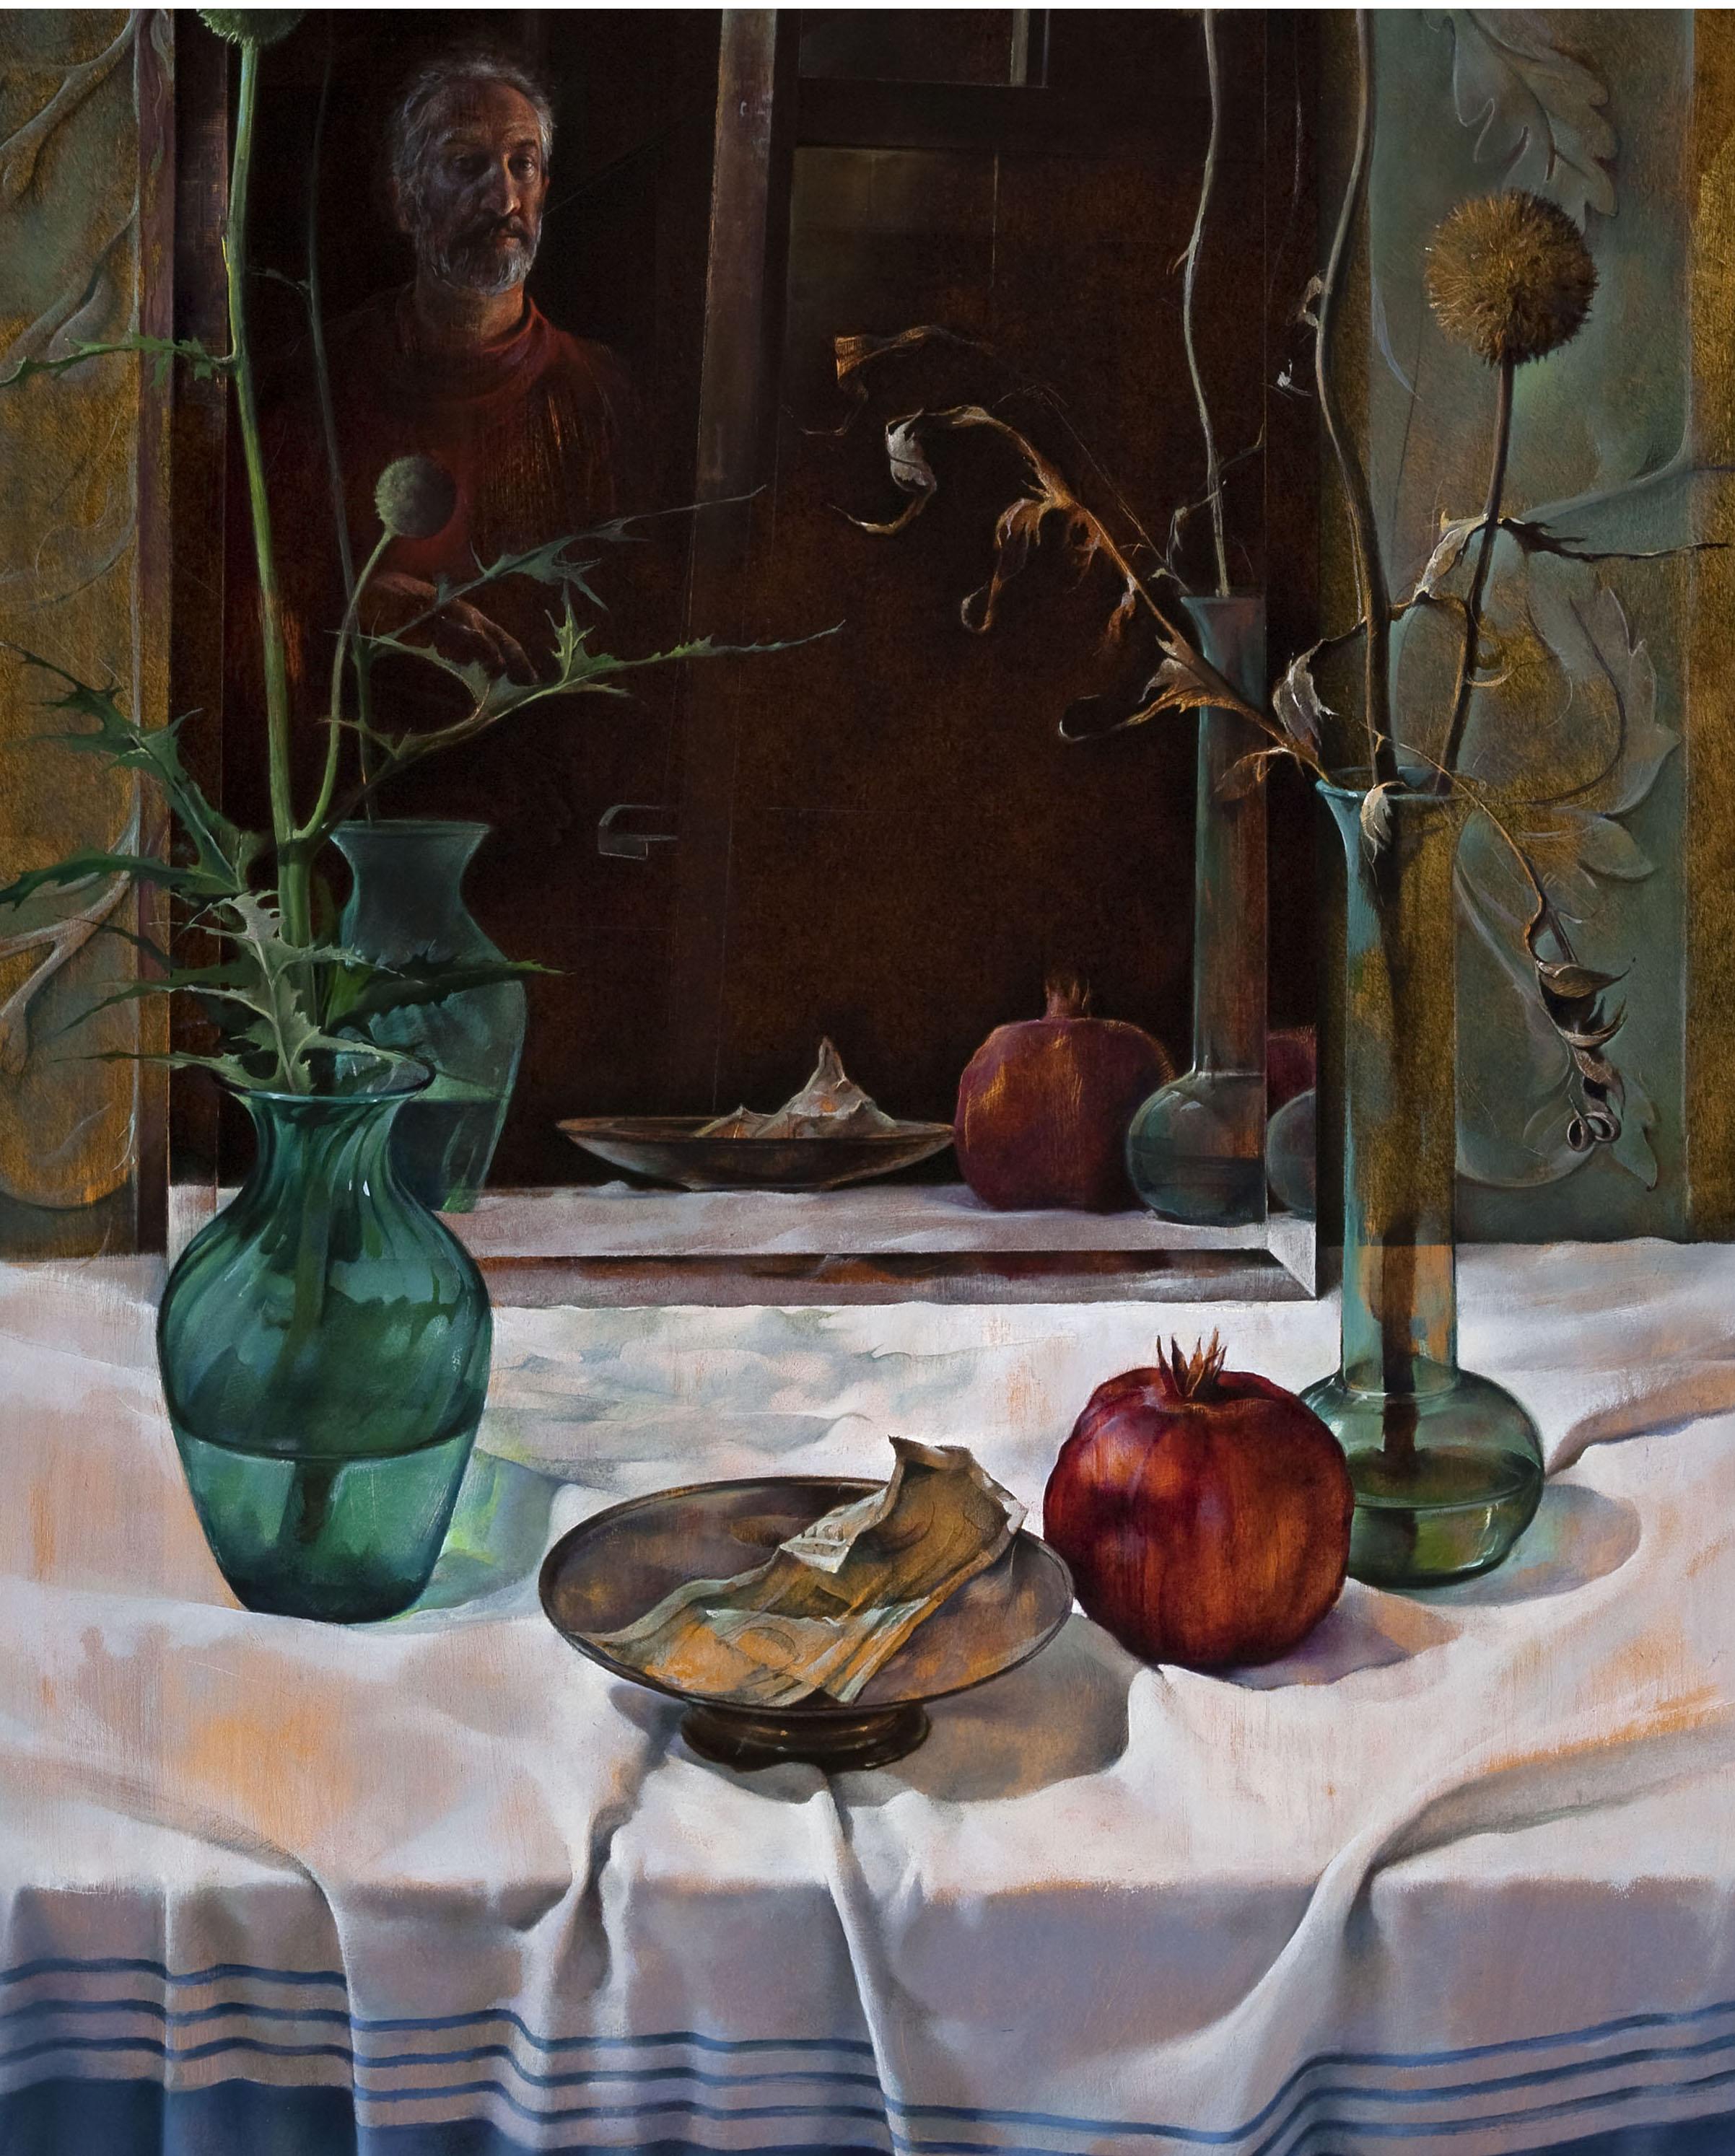 Joseph Nicoletti A Retrospective  Museum of Art  Bates College